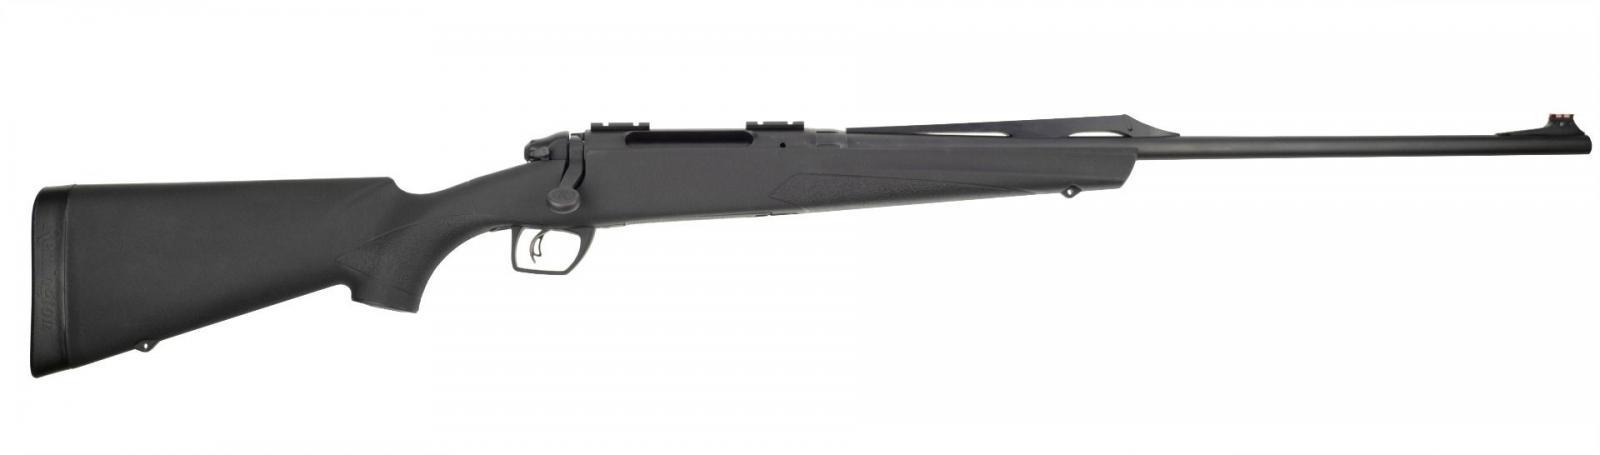 Carabine à verrou REMINGTON 783 synthétique avec bande de battue Cal. 300 Win Mag